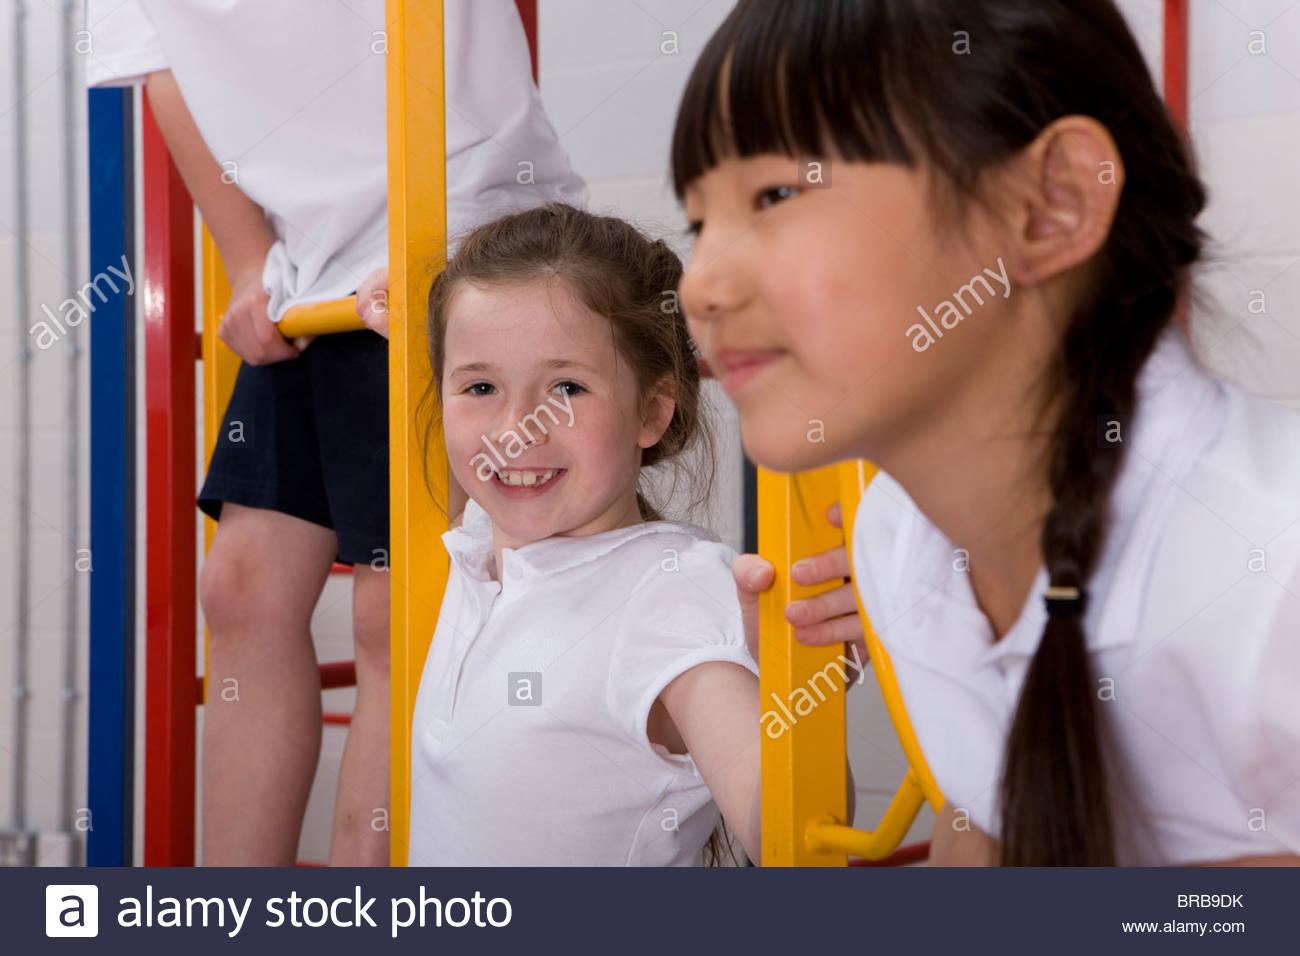 School children climbing gymnasium climbing equipment - Stock Image